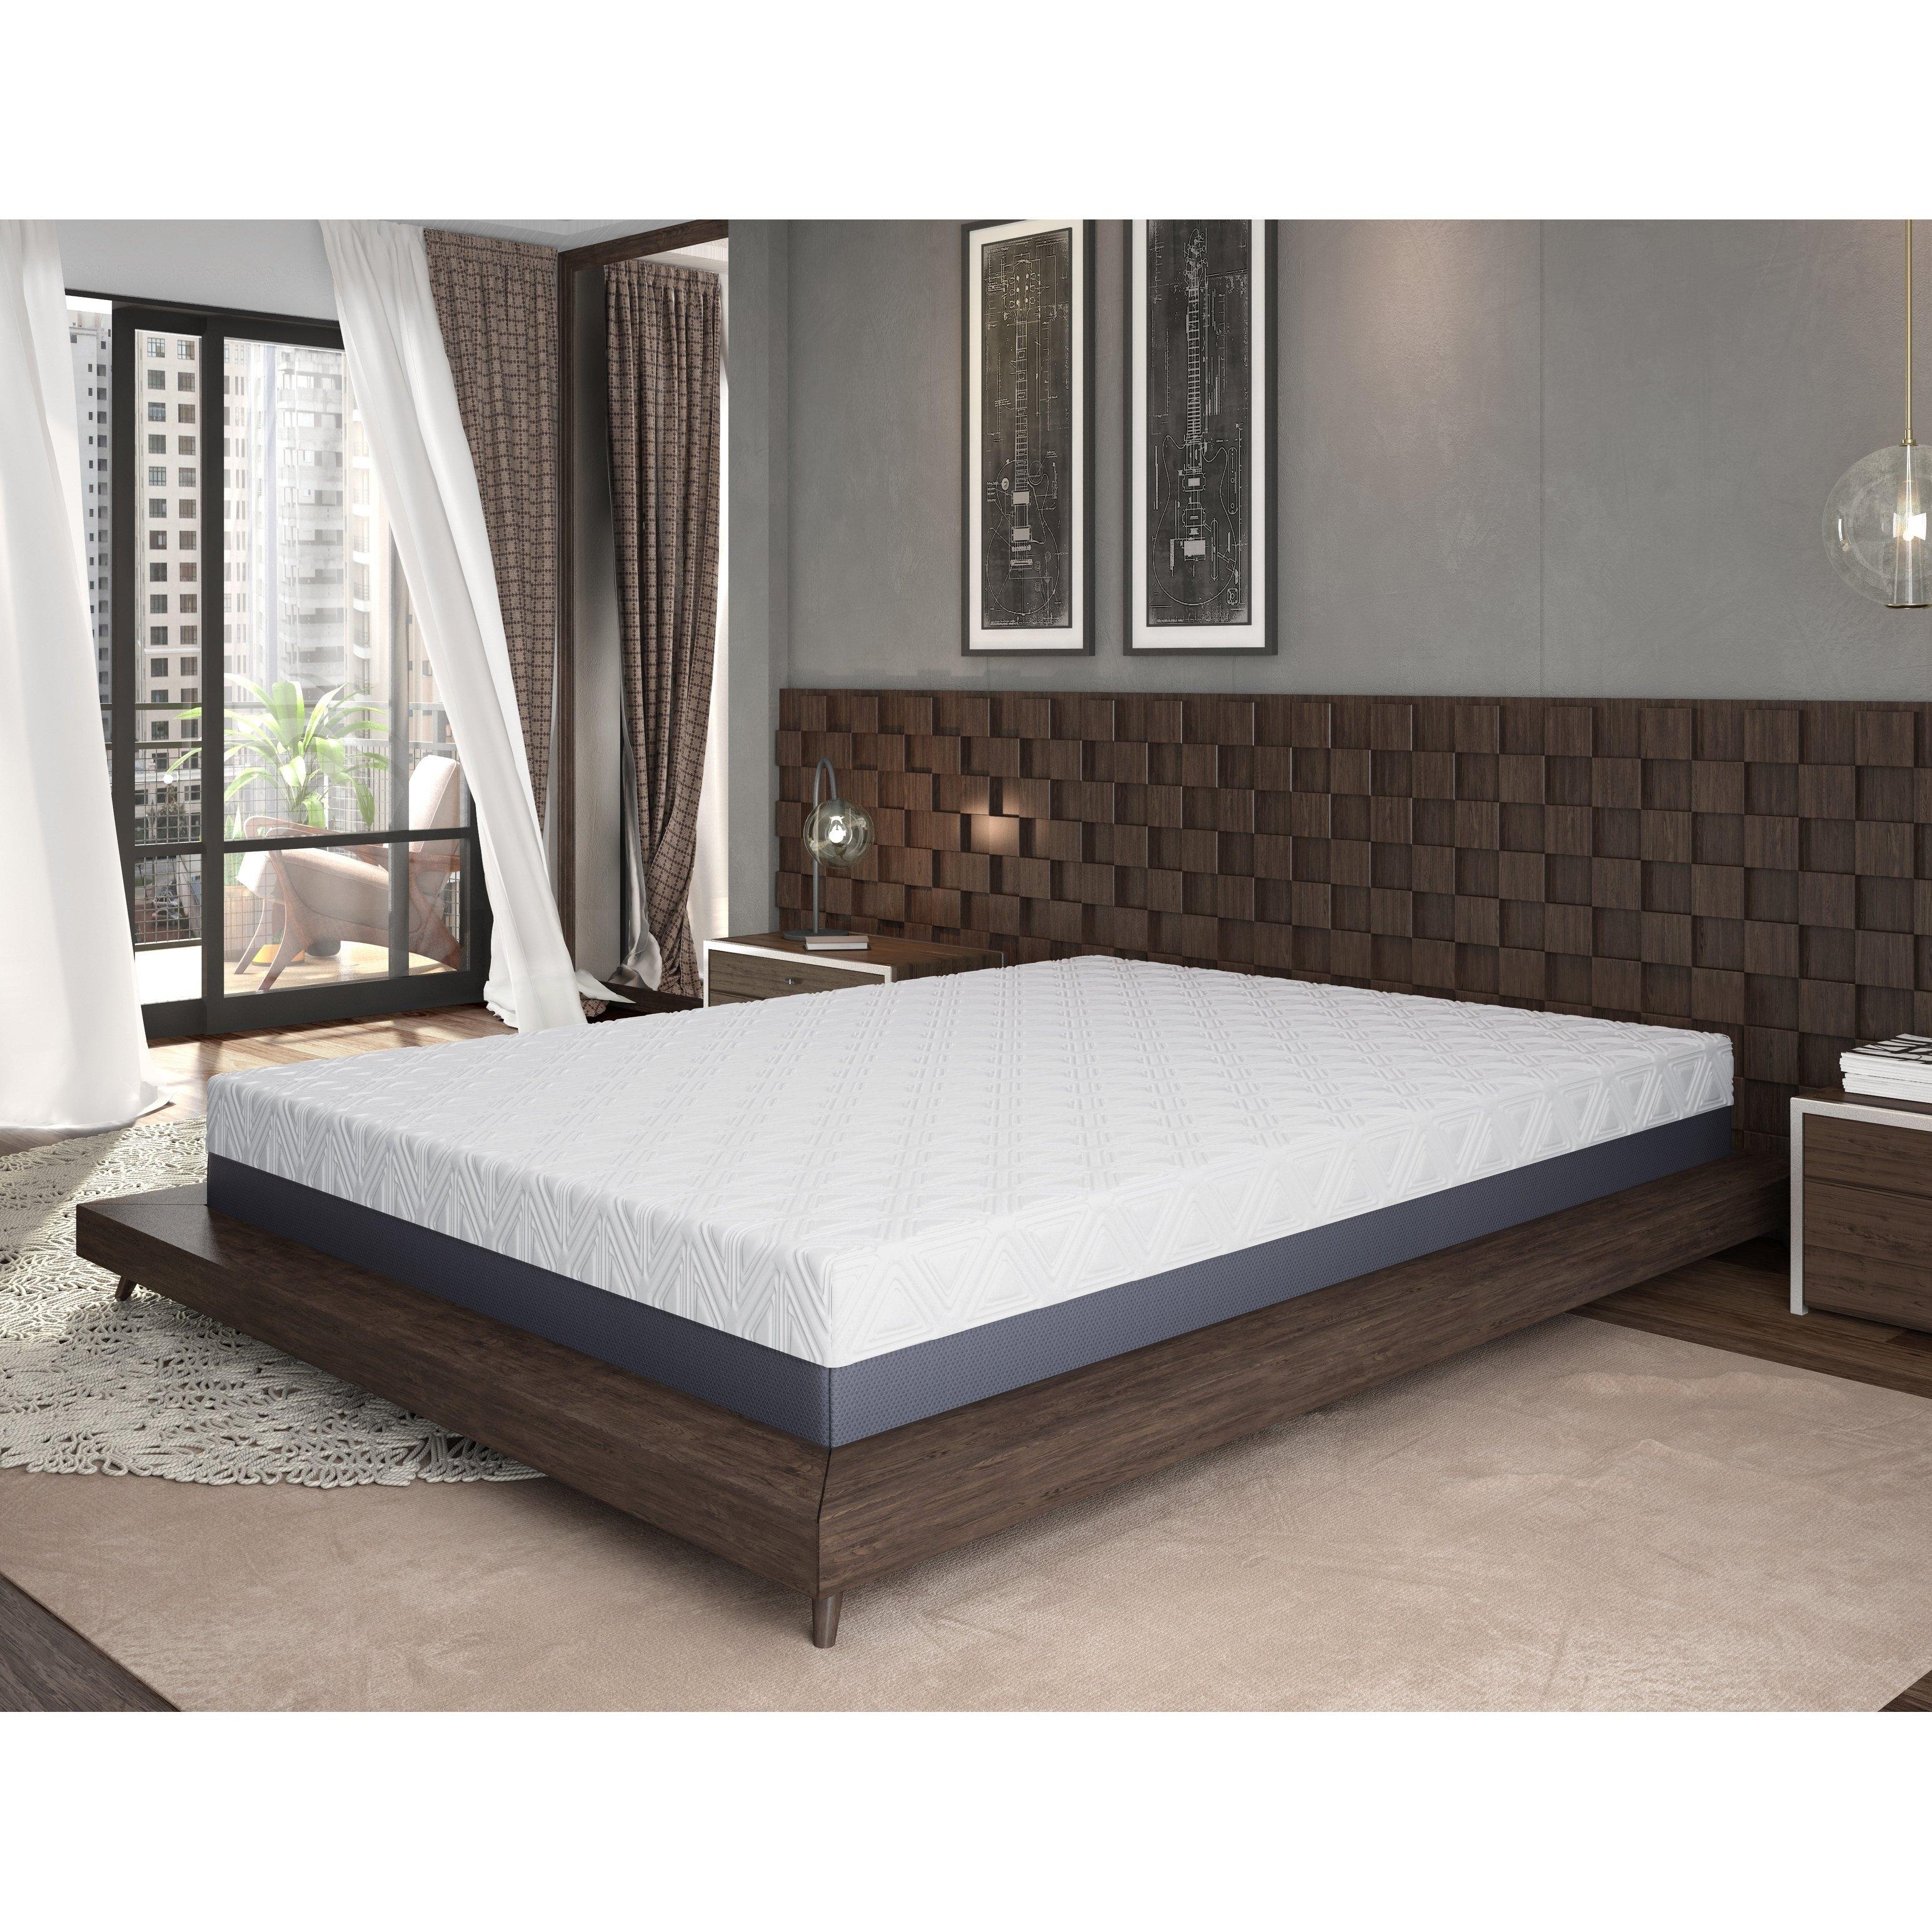 Omne Sleep 10 Inch Queen Size Gel Memory Foam Mattress Black Mattress Foam Mattress Queen Memory Foam Mattress